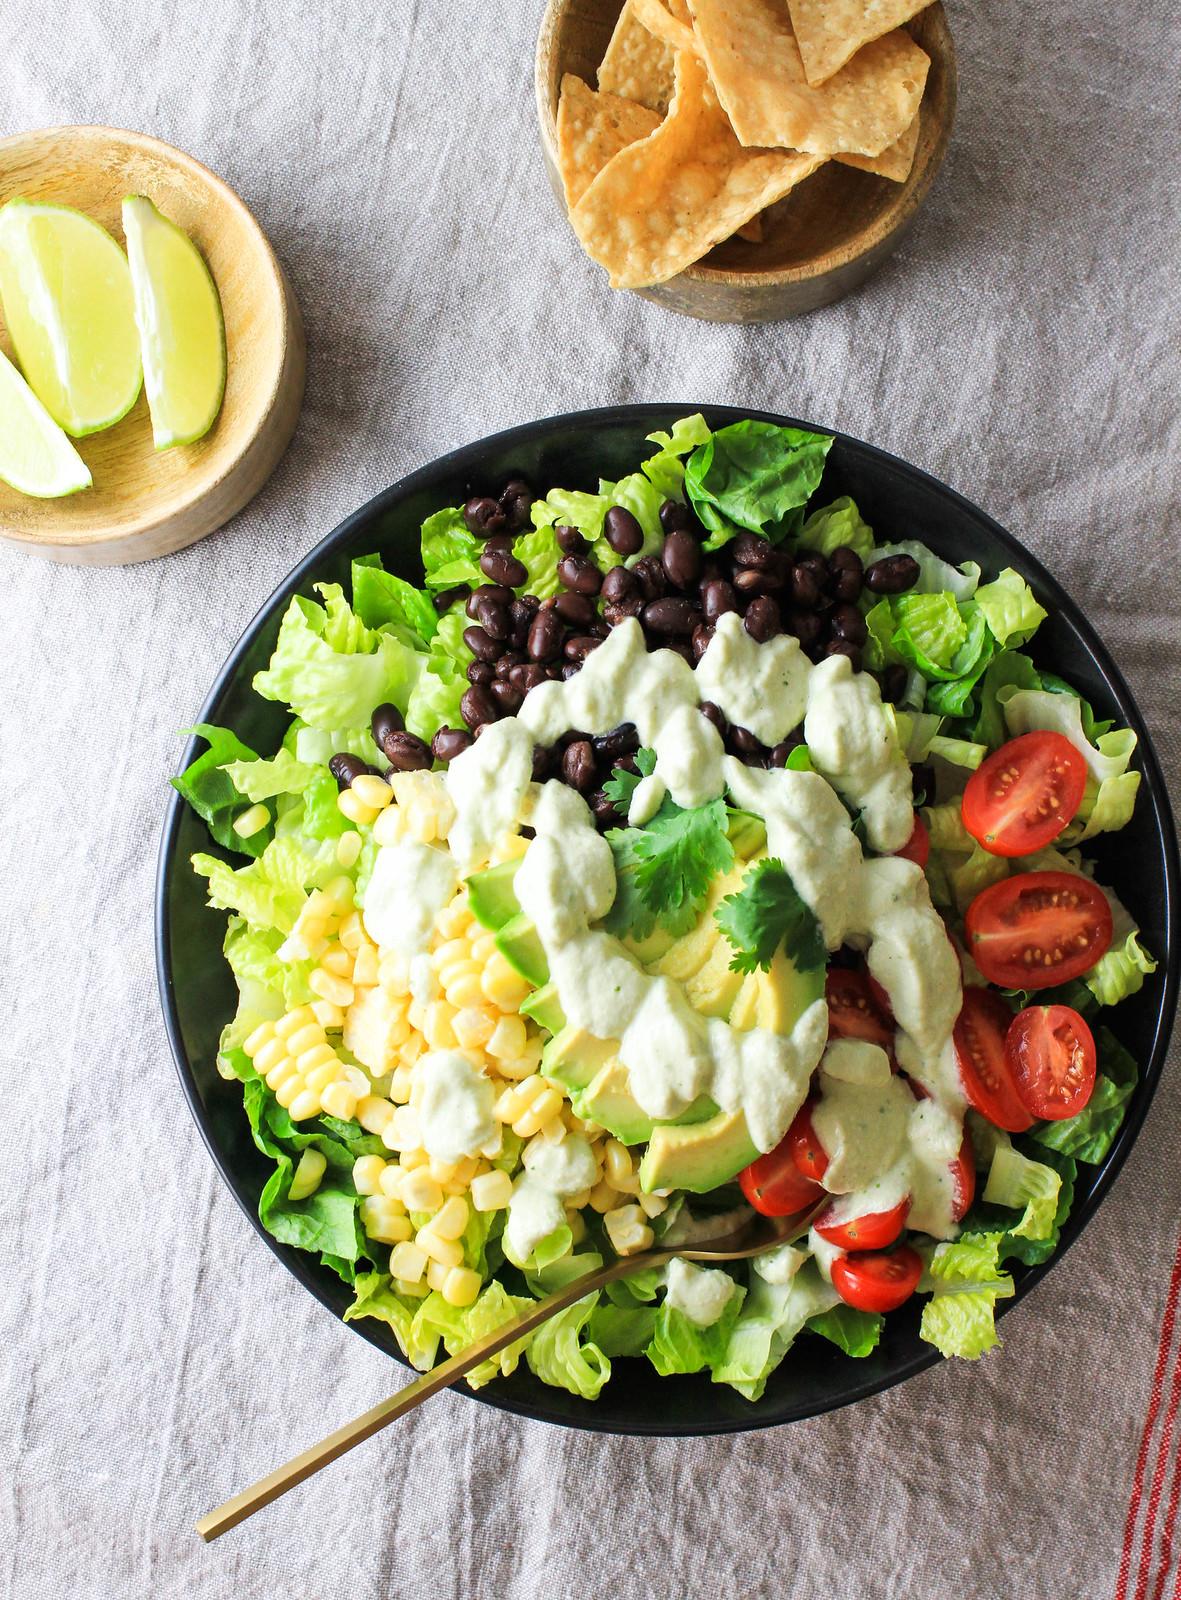 Southwestern Salad + Hatch Chile Cashew Dressing